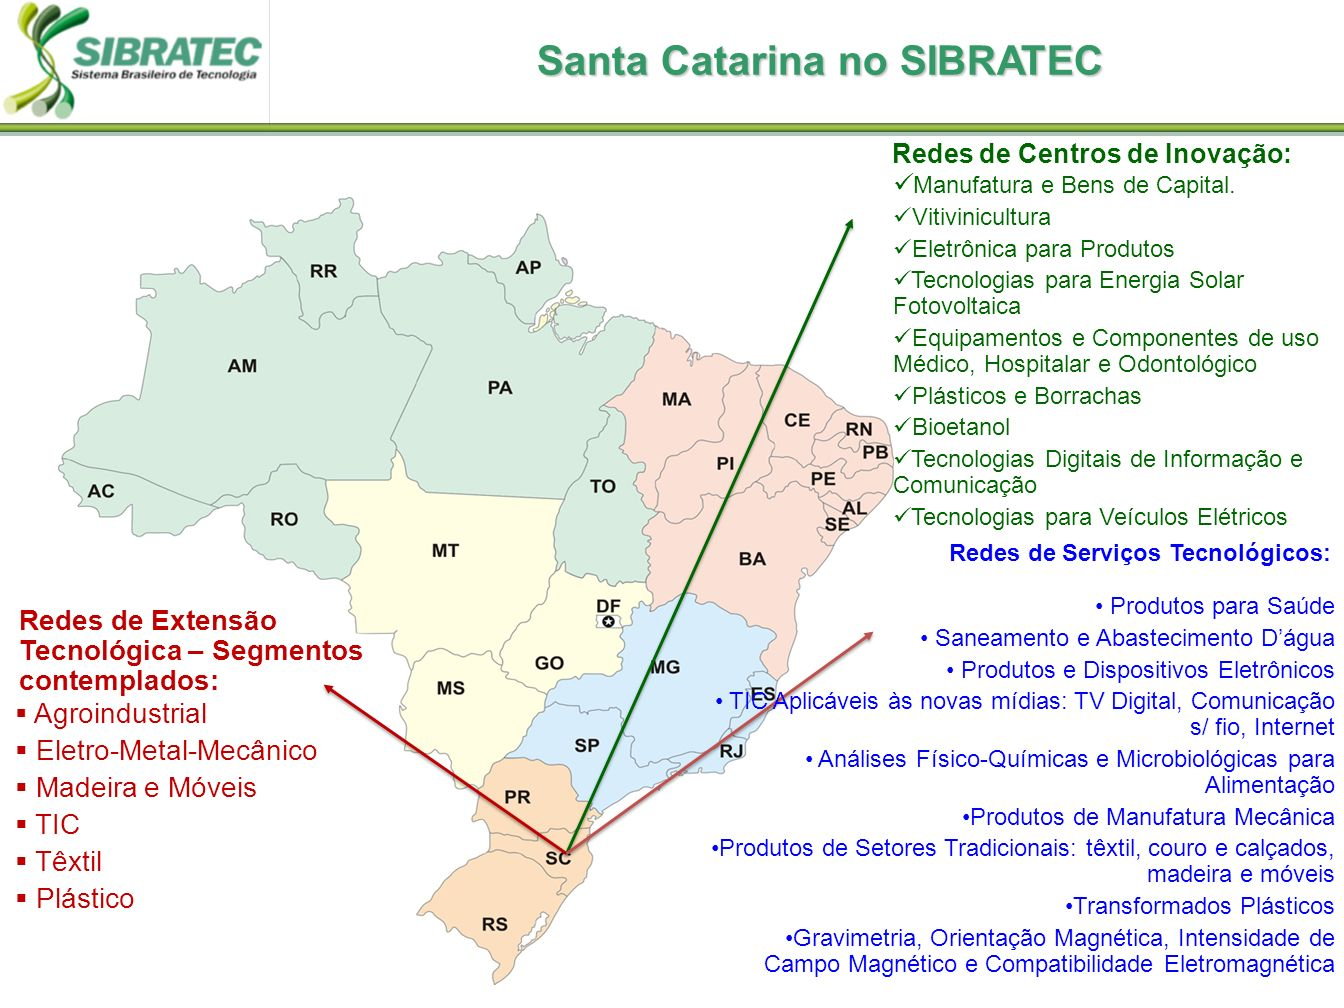 Santa Catarina no SIBRATEC